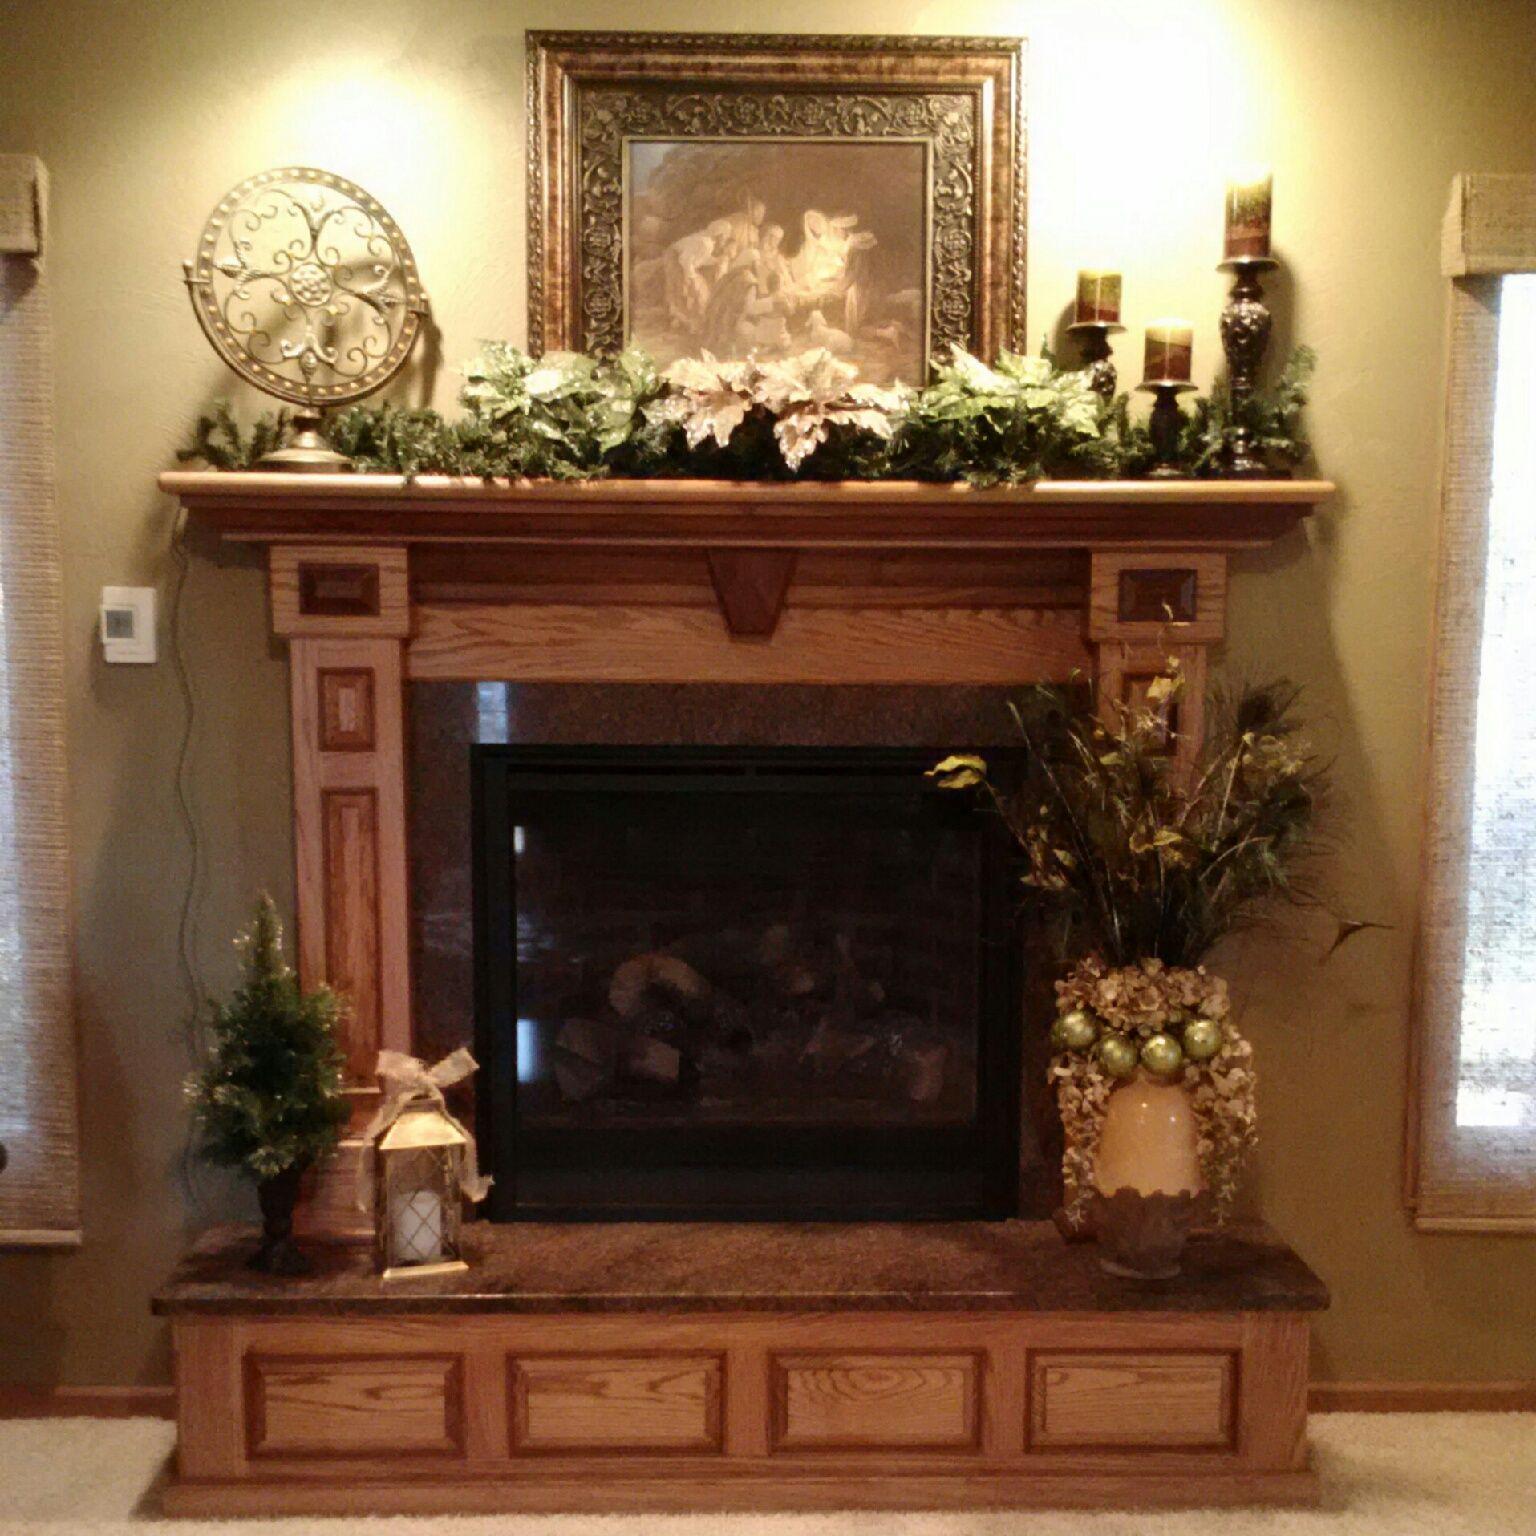 fireplace mantel design ideas home design ideas slimpro co for the rh pinterest com